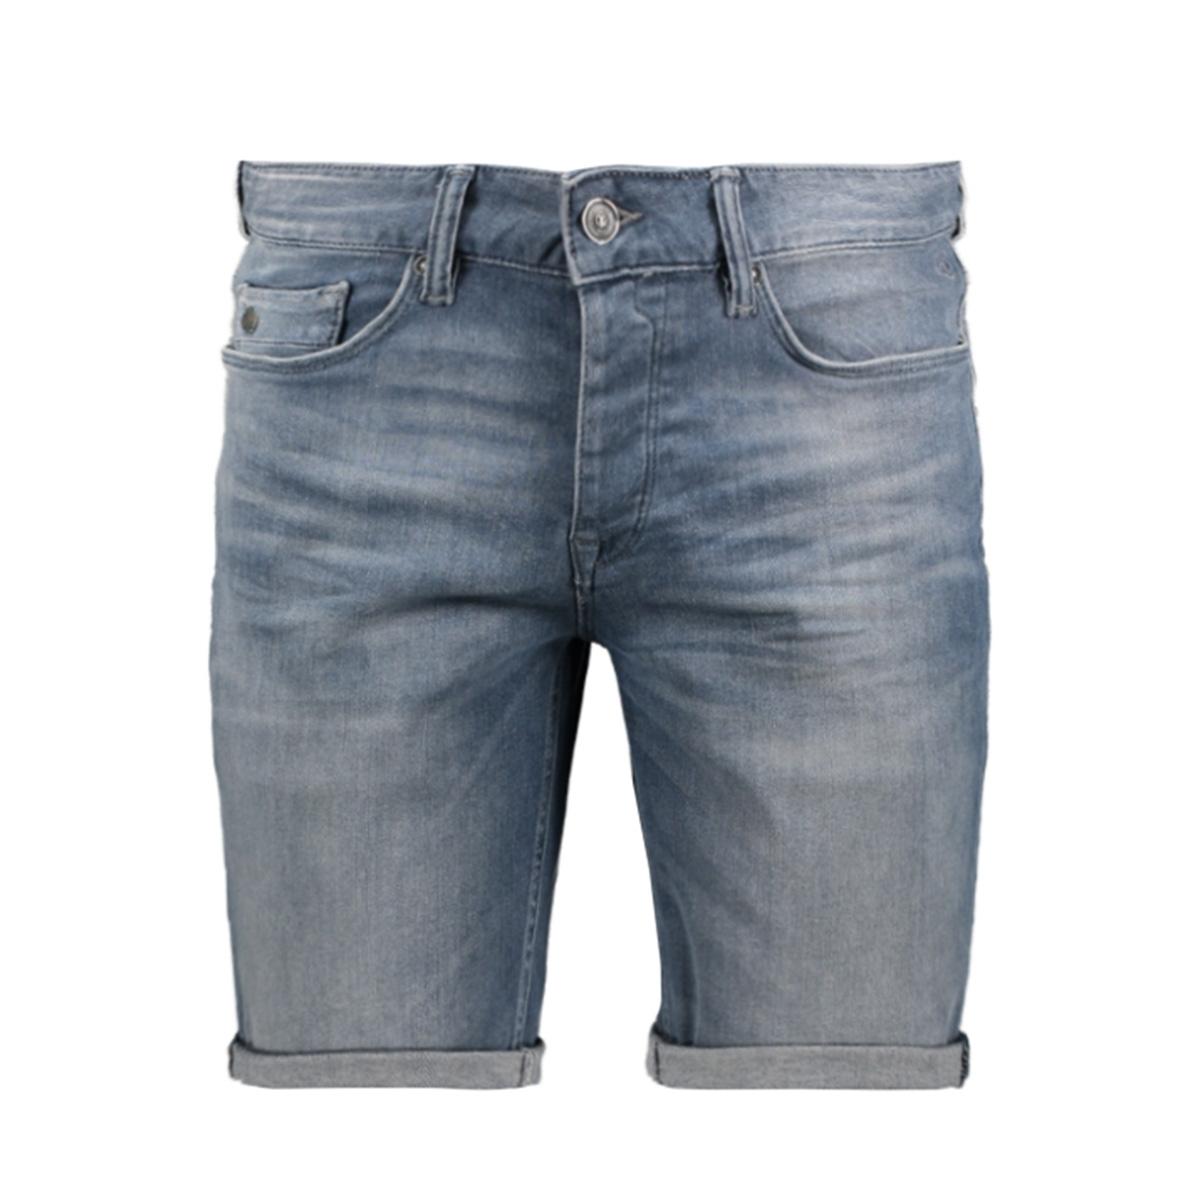 cope shorts grey blue comfort csh202213 cast iron korte